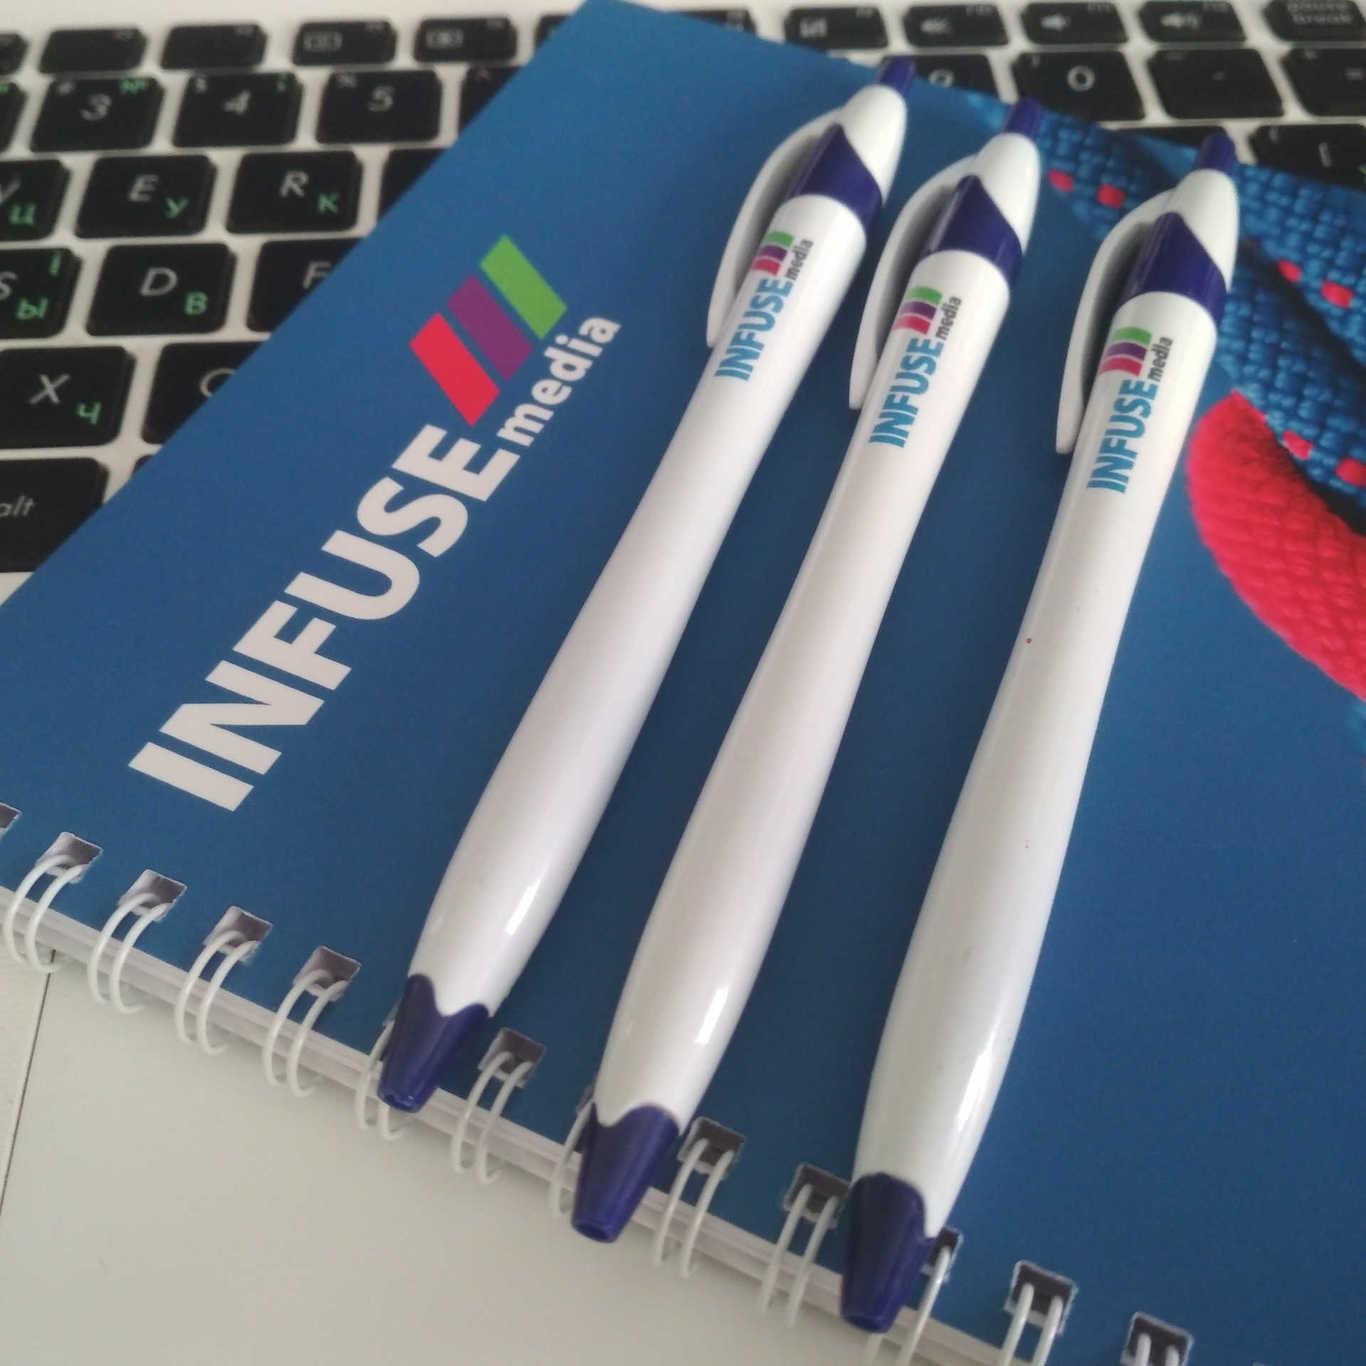 Арт  Print_01  Ручка пластиковая